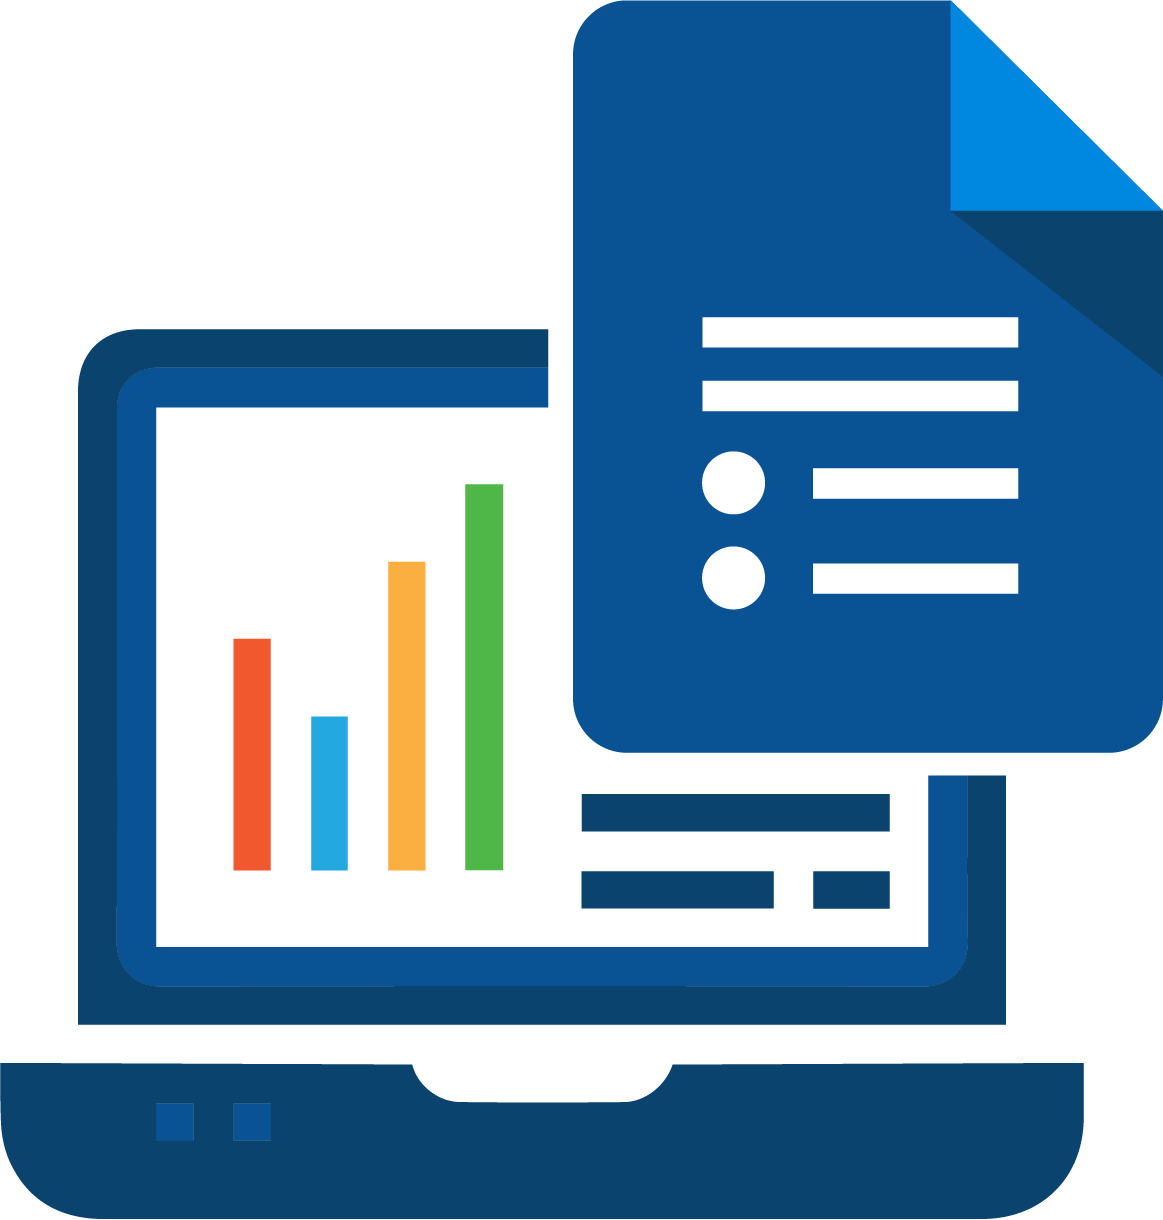 Data Report for IEP Goals